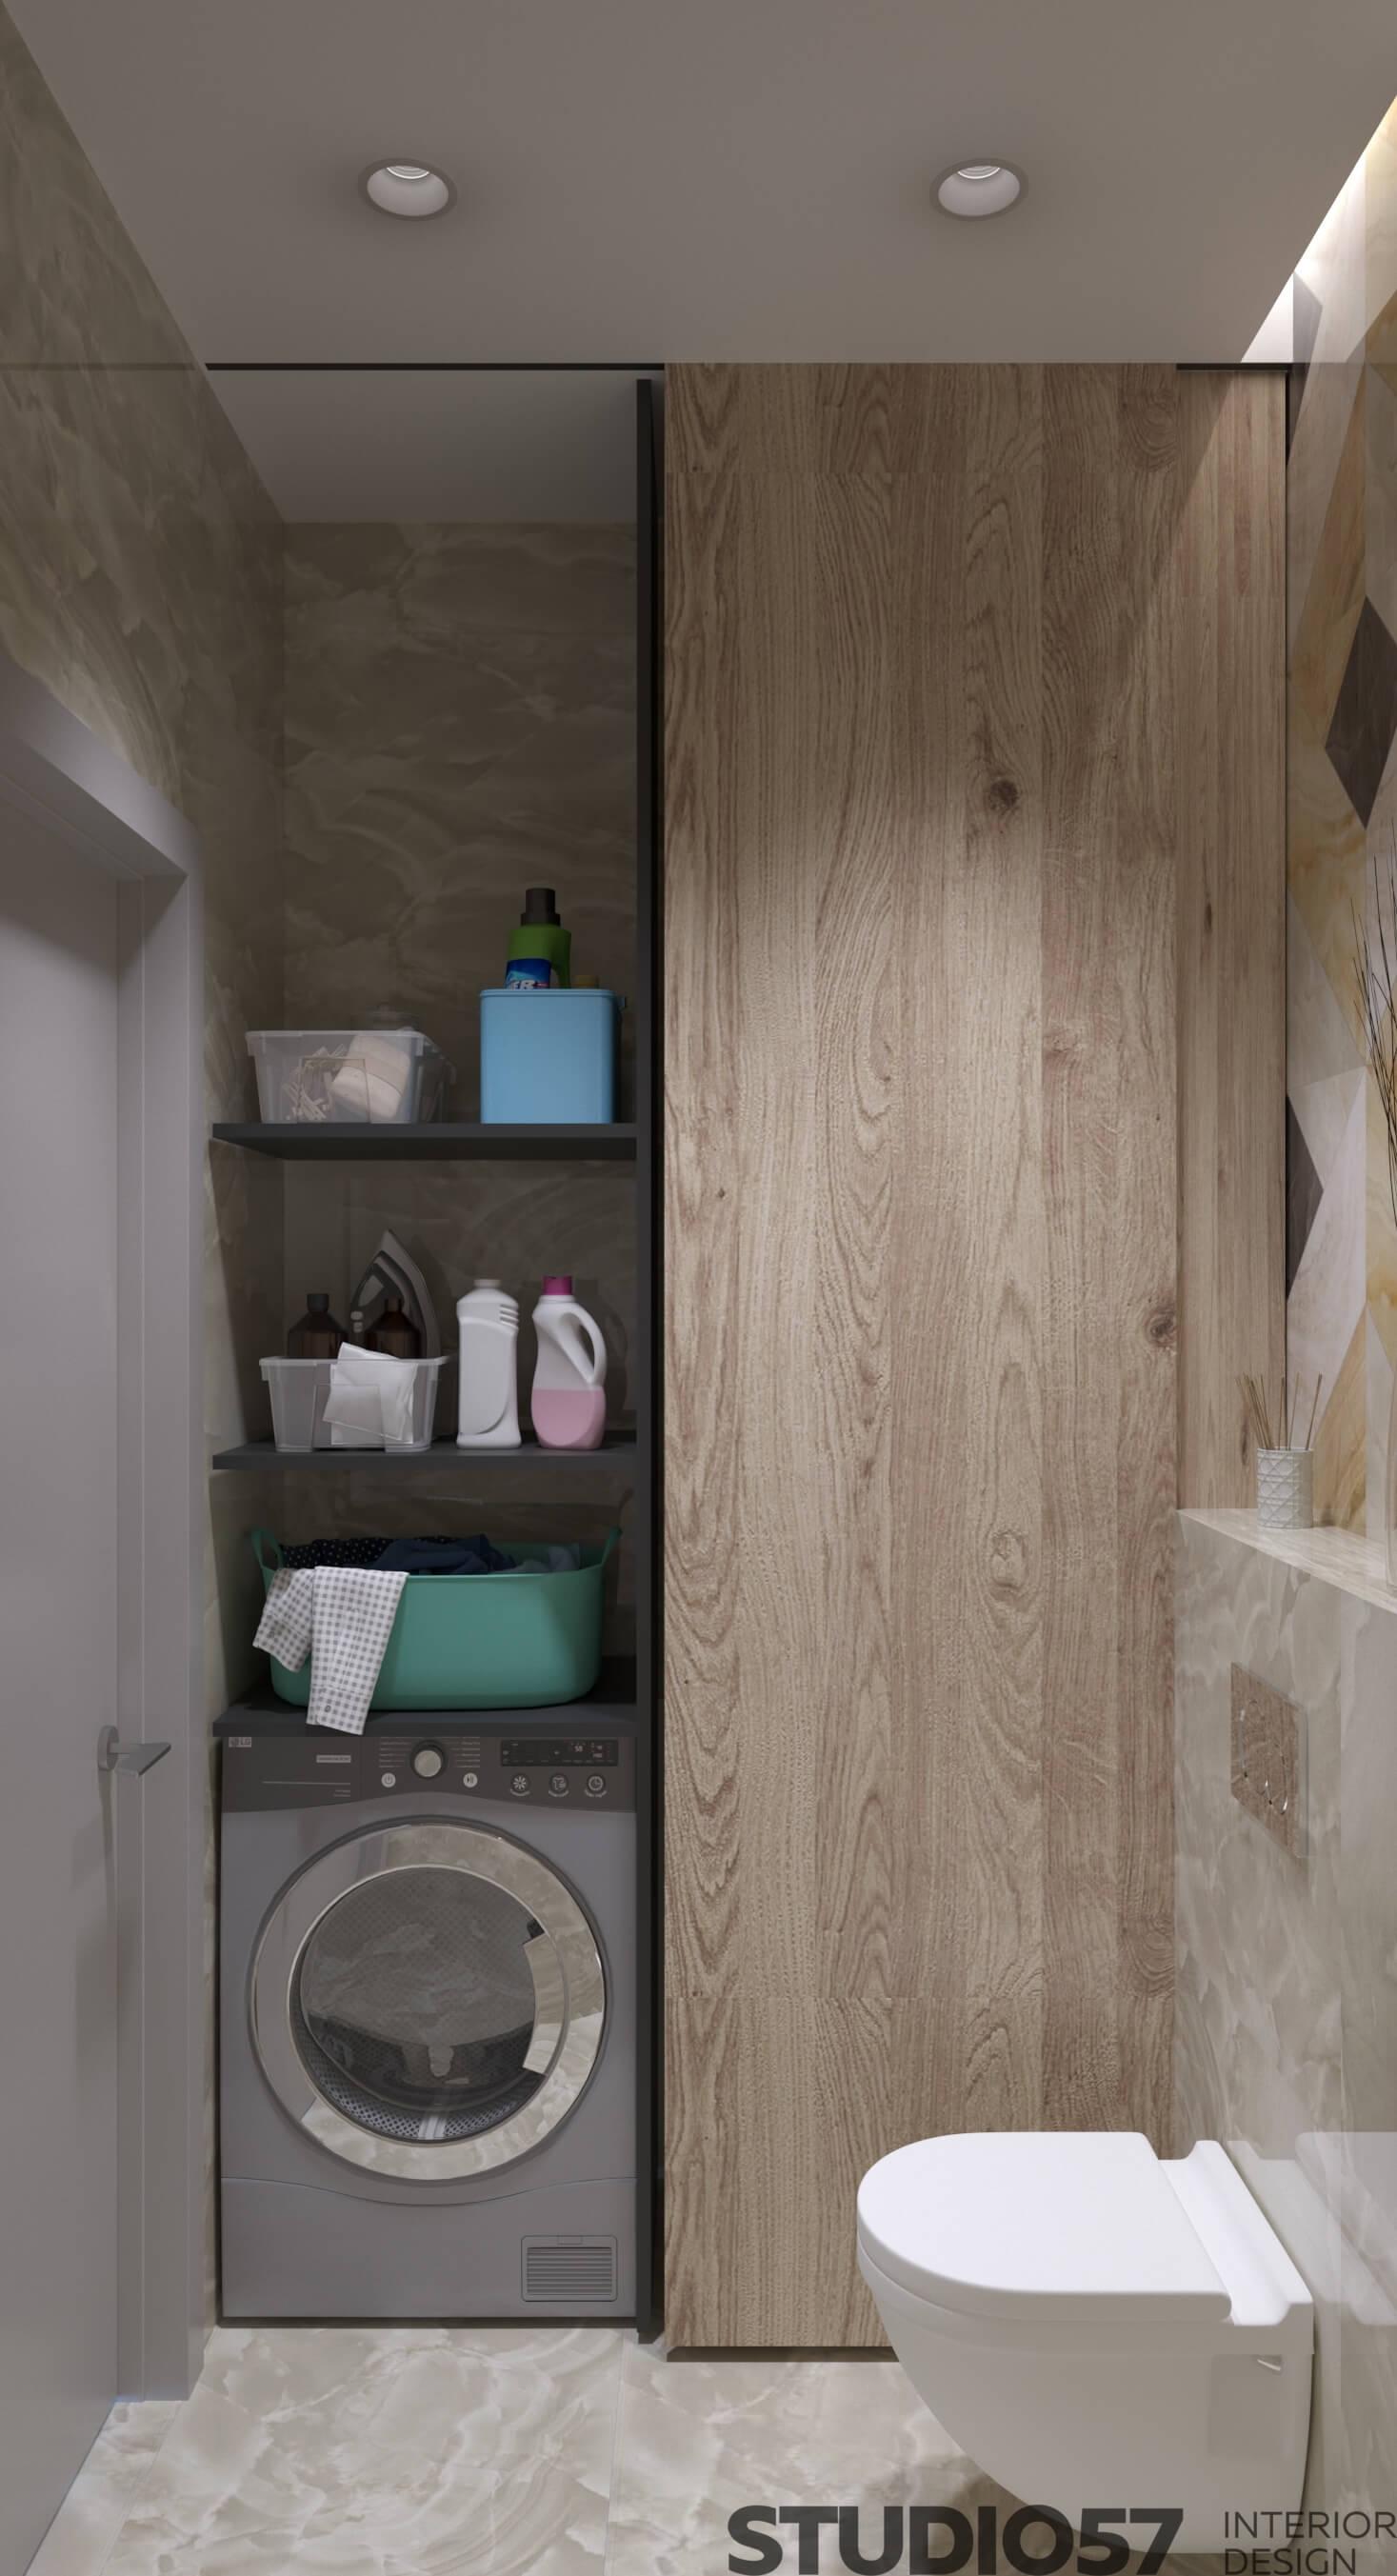 Washing machine in the bathroom photo